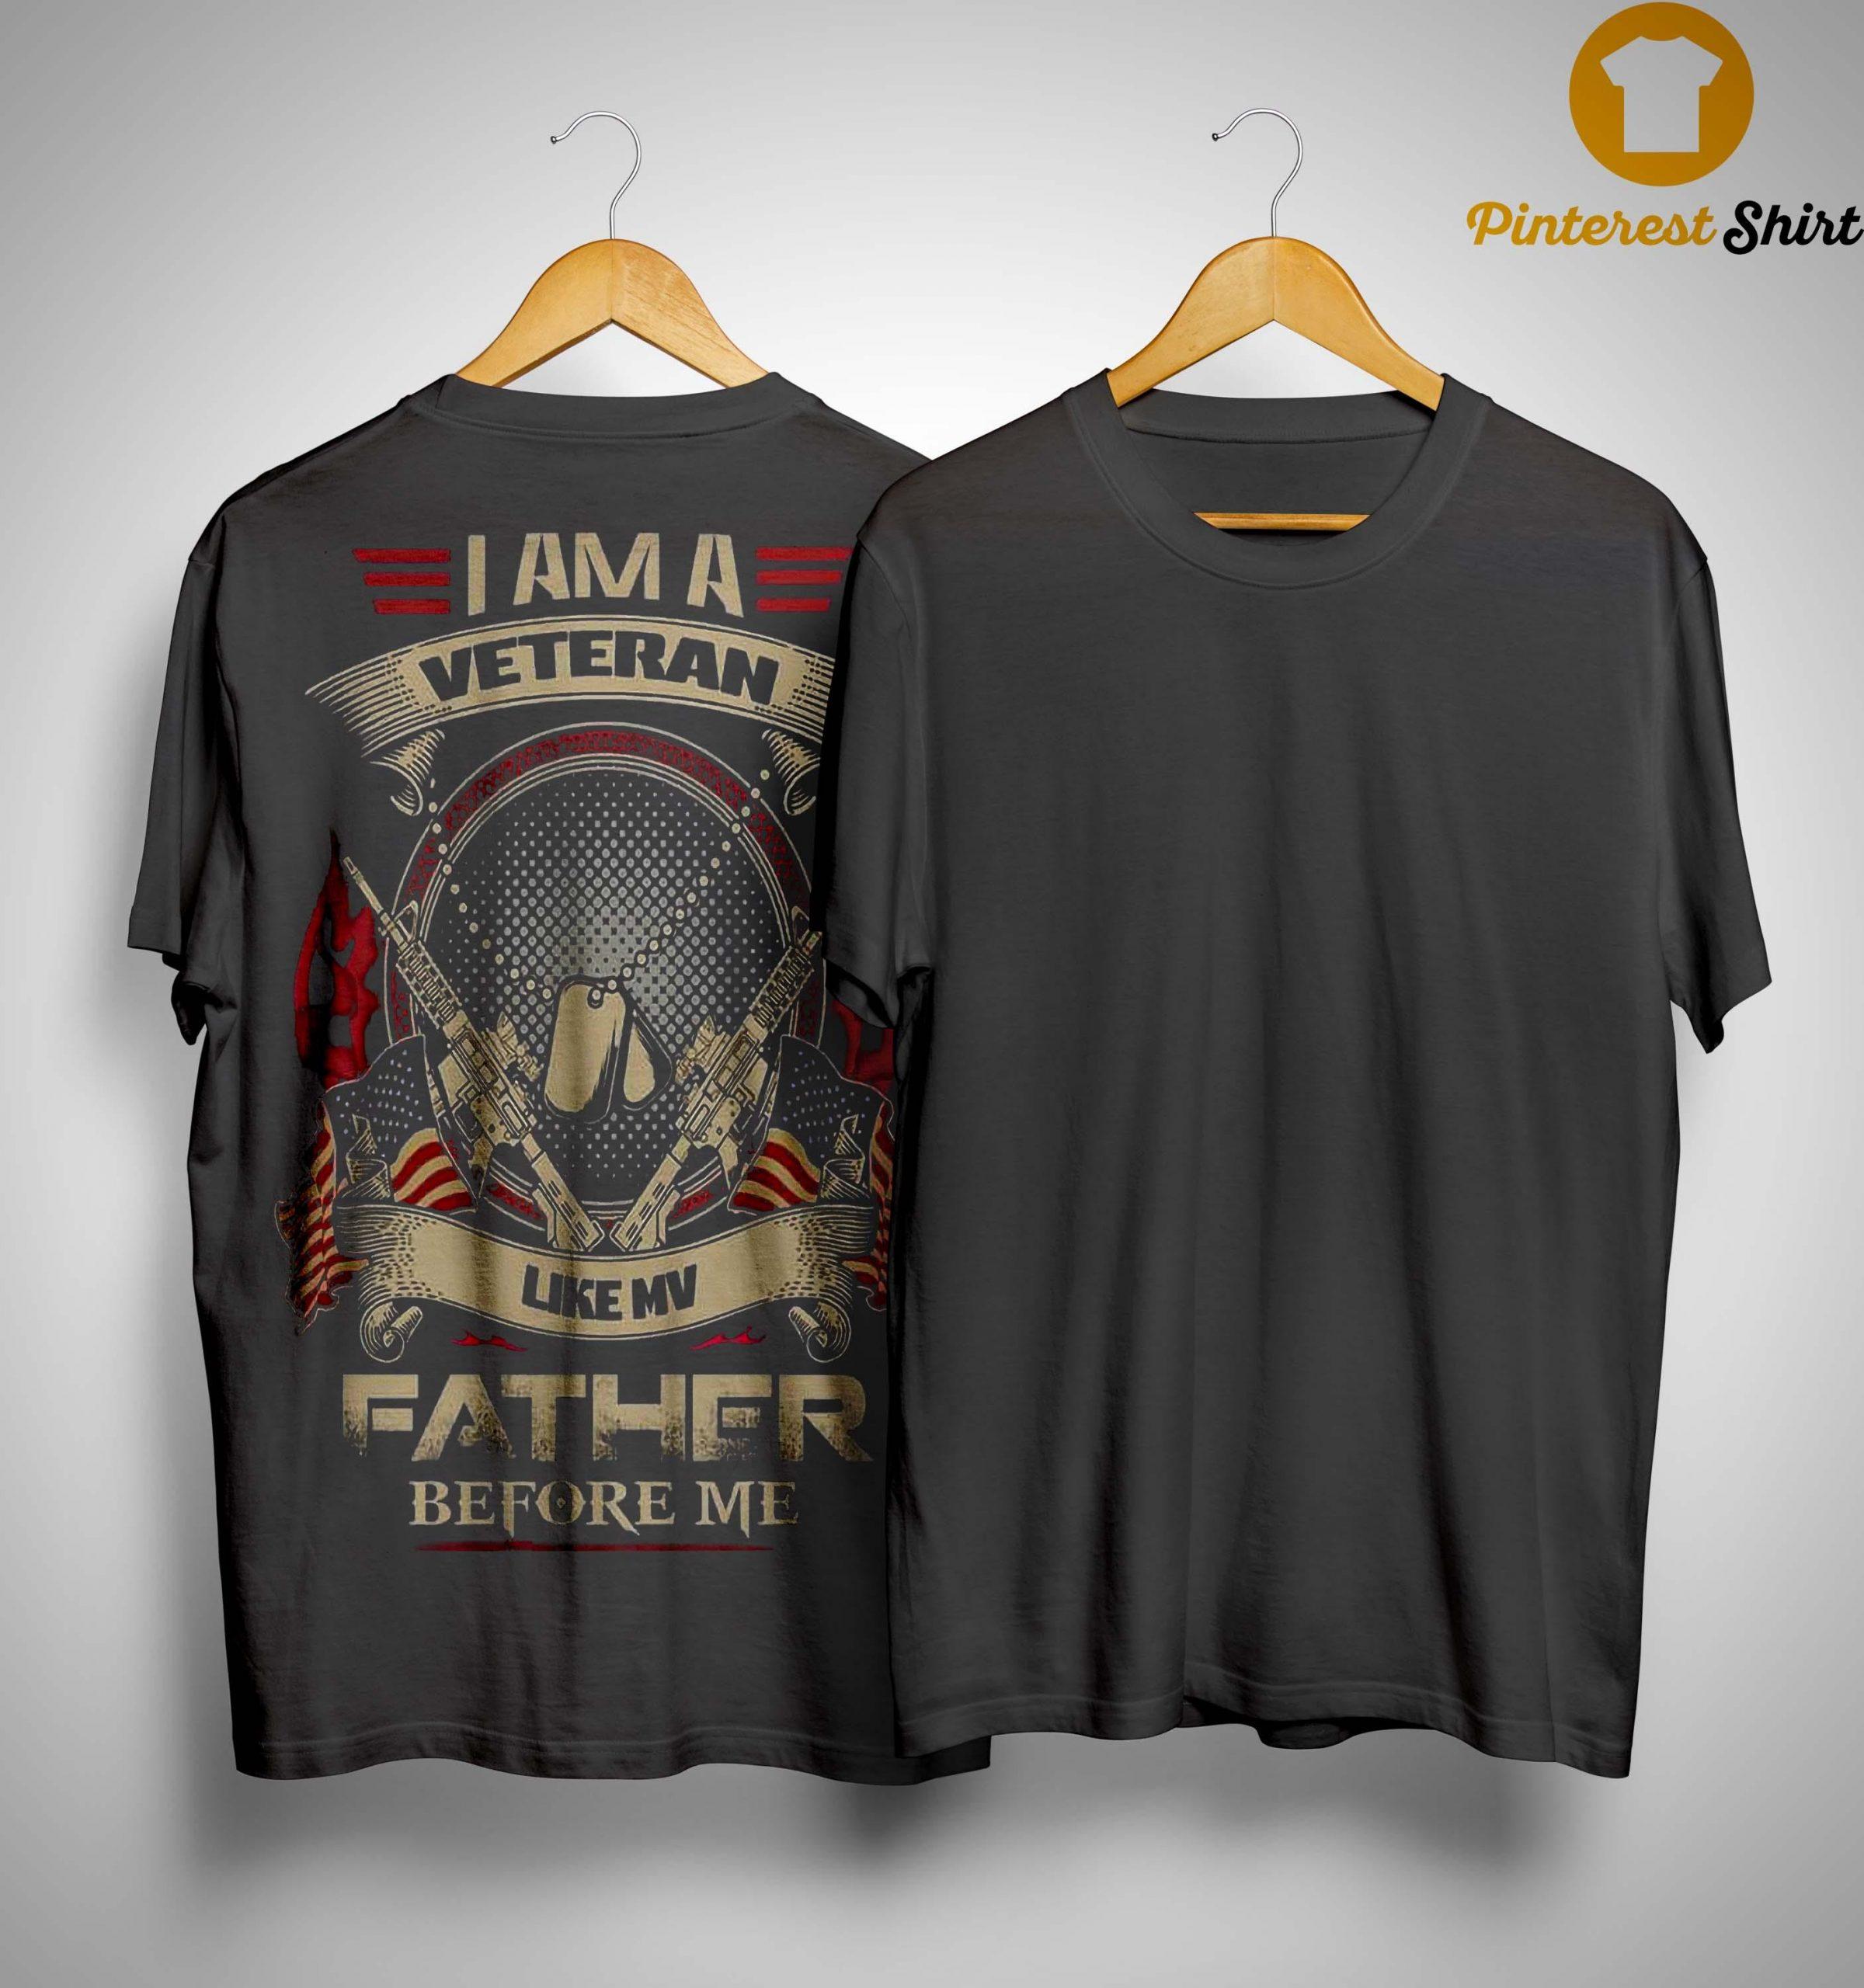 I Am Veteran Like My Father Before Me Shirt